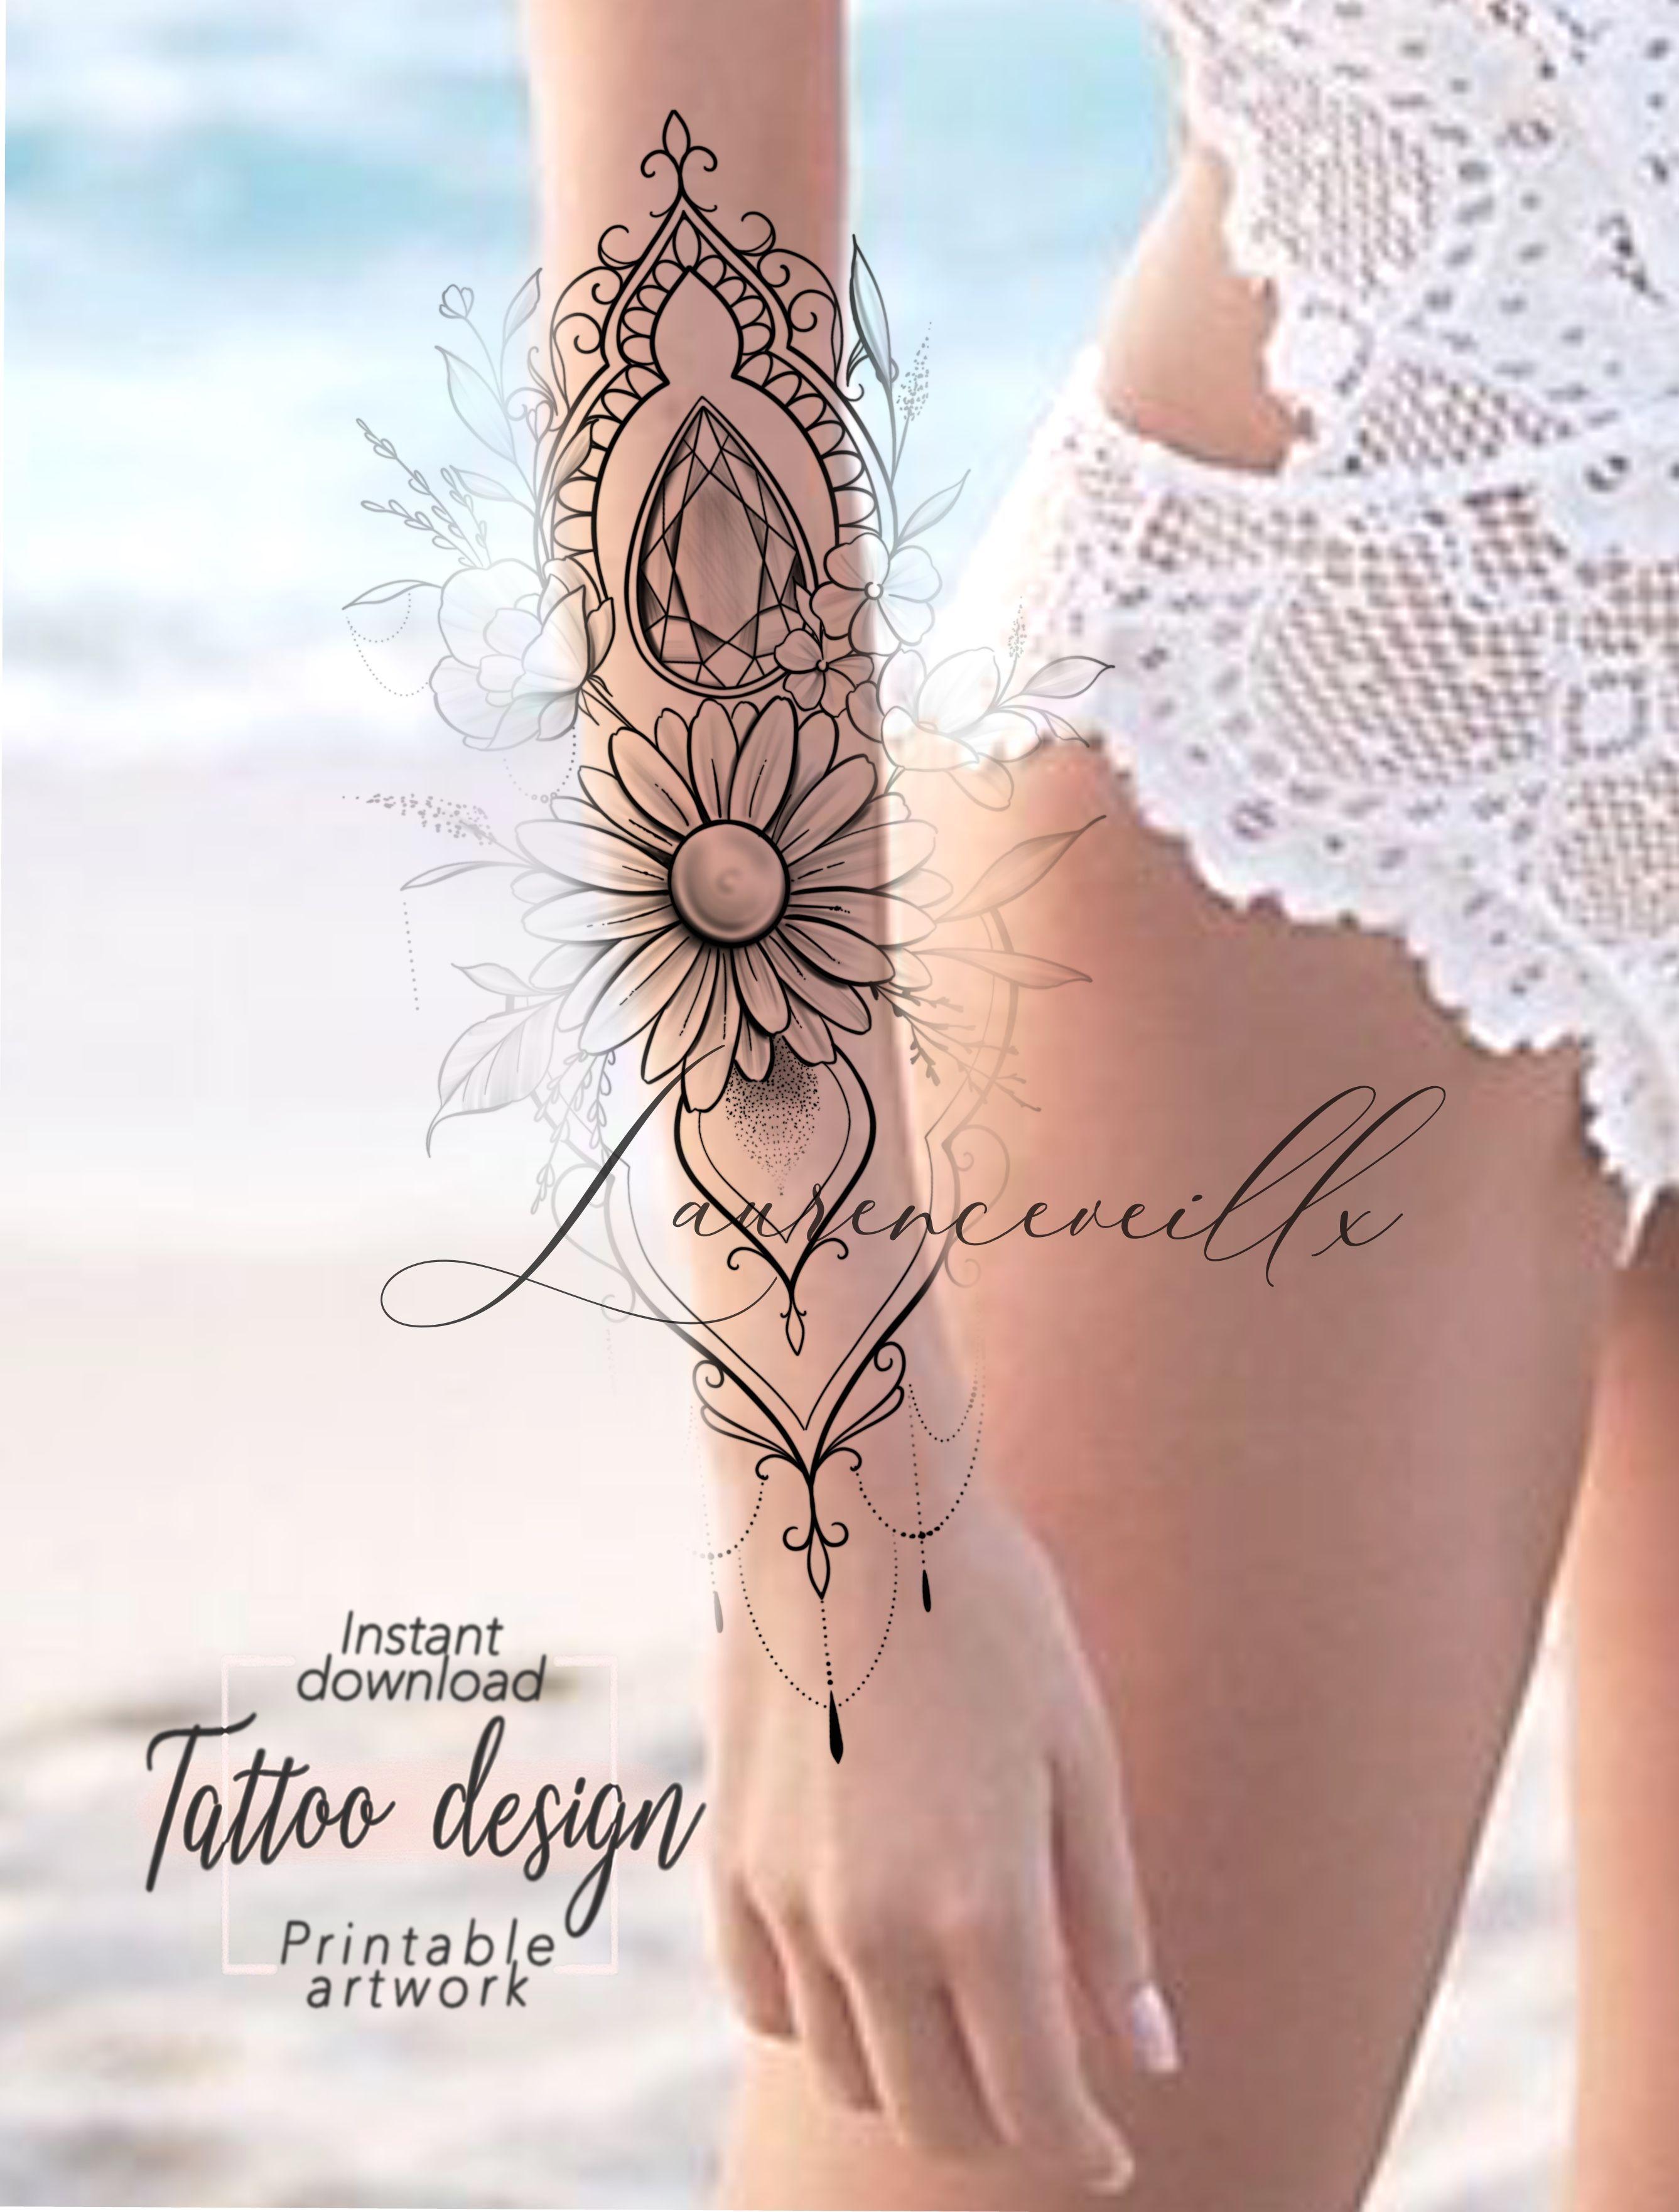 Daisyflower Design Etsy Ornemental Sleeve Tattoo Daisyflower Design Etsy In 2020 Tattoos For Women Half Sleeve Half Sleeve Tattoos Designs Half Sleeve Tattoo